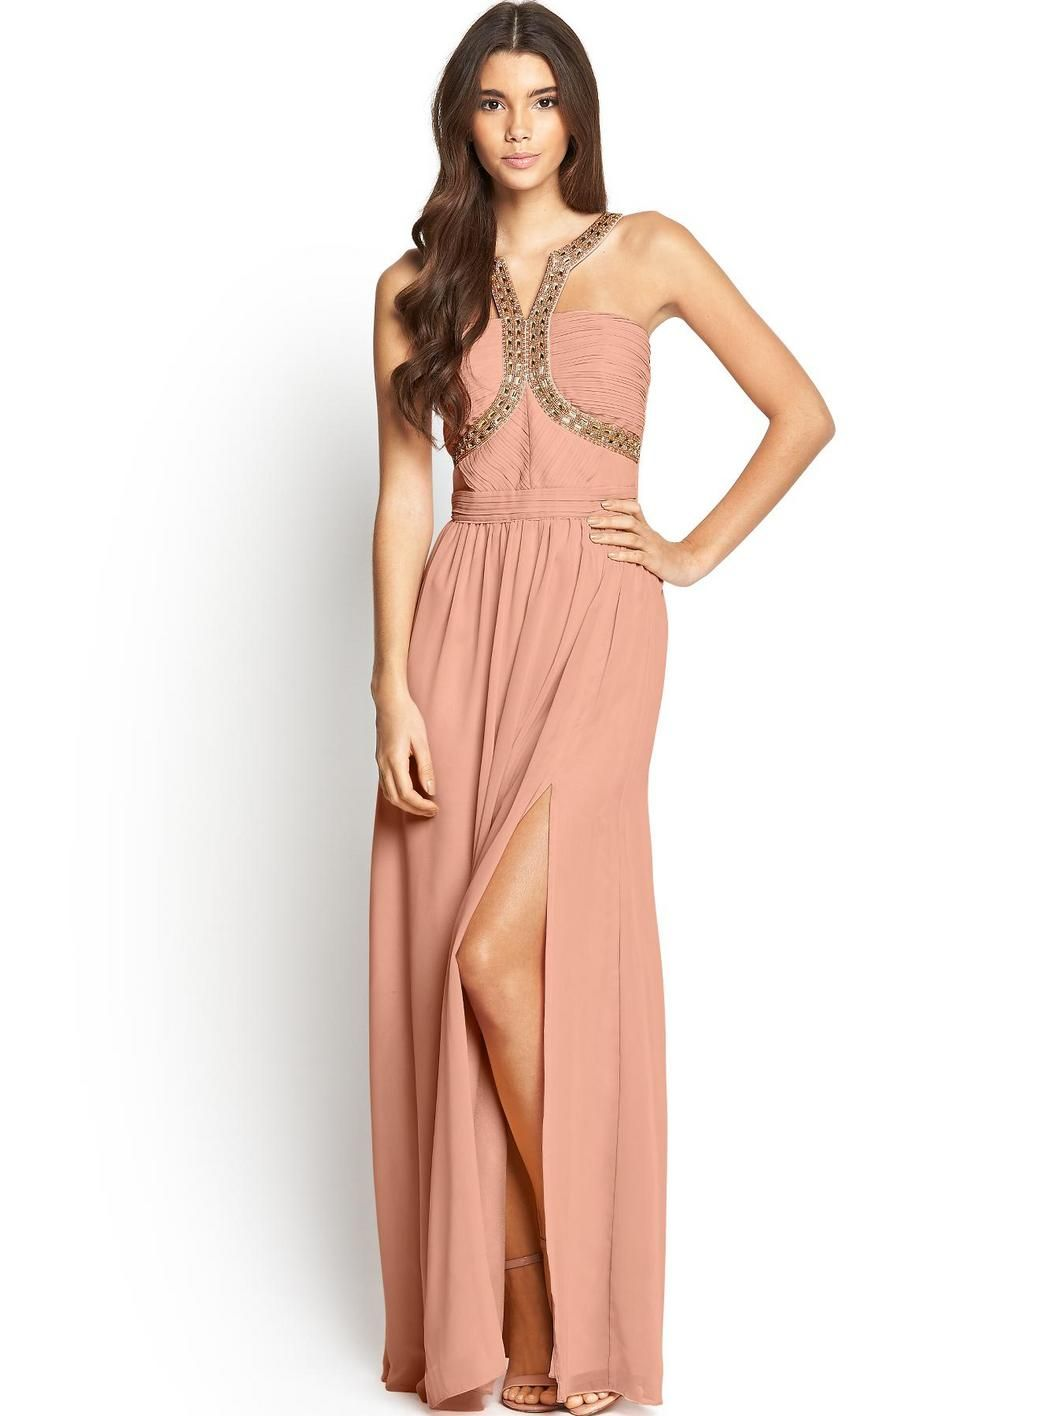 Maxi dress httplittlewoodslittle mistress maxi dress maxi dress httplittlewoodslittle mistress ombrellifo Image collections